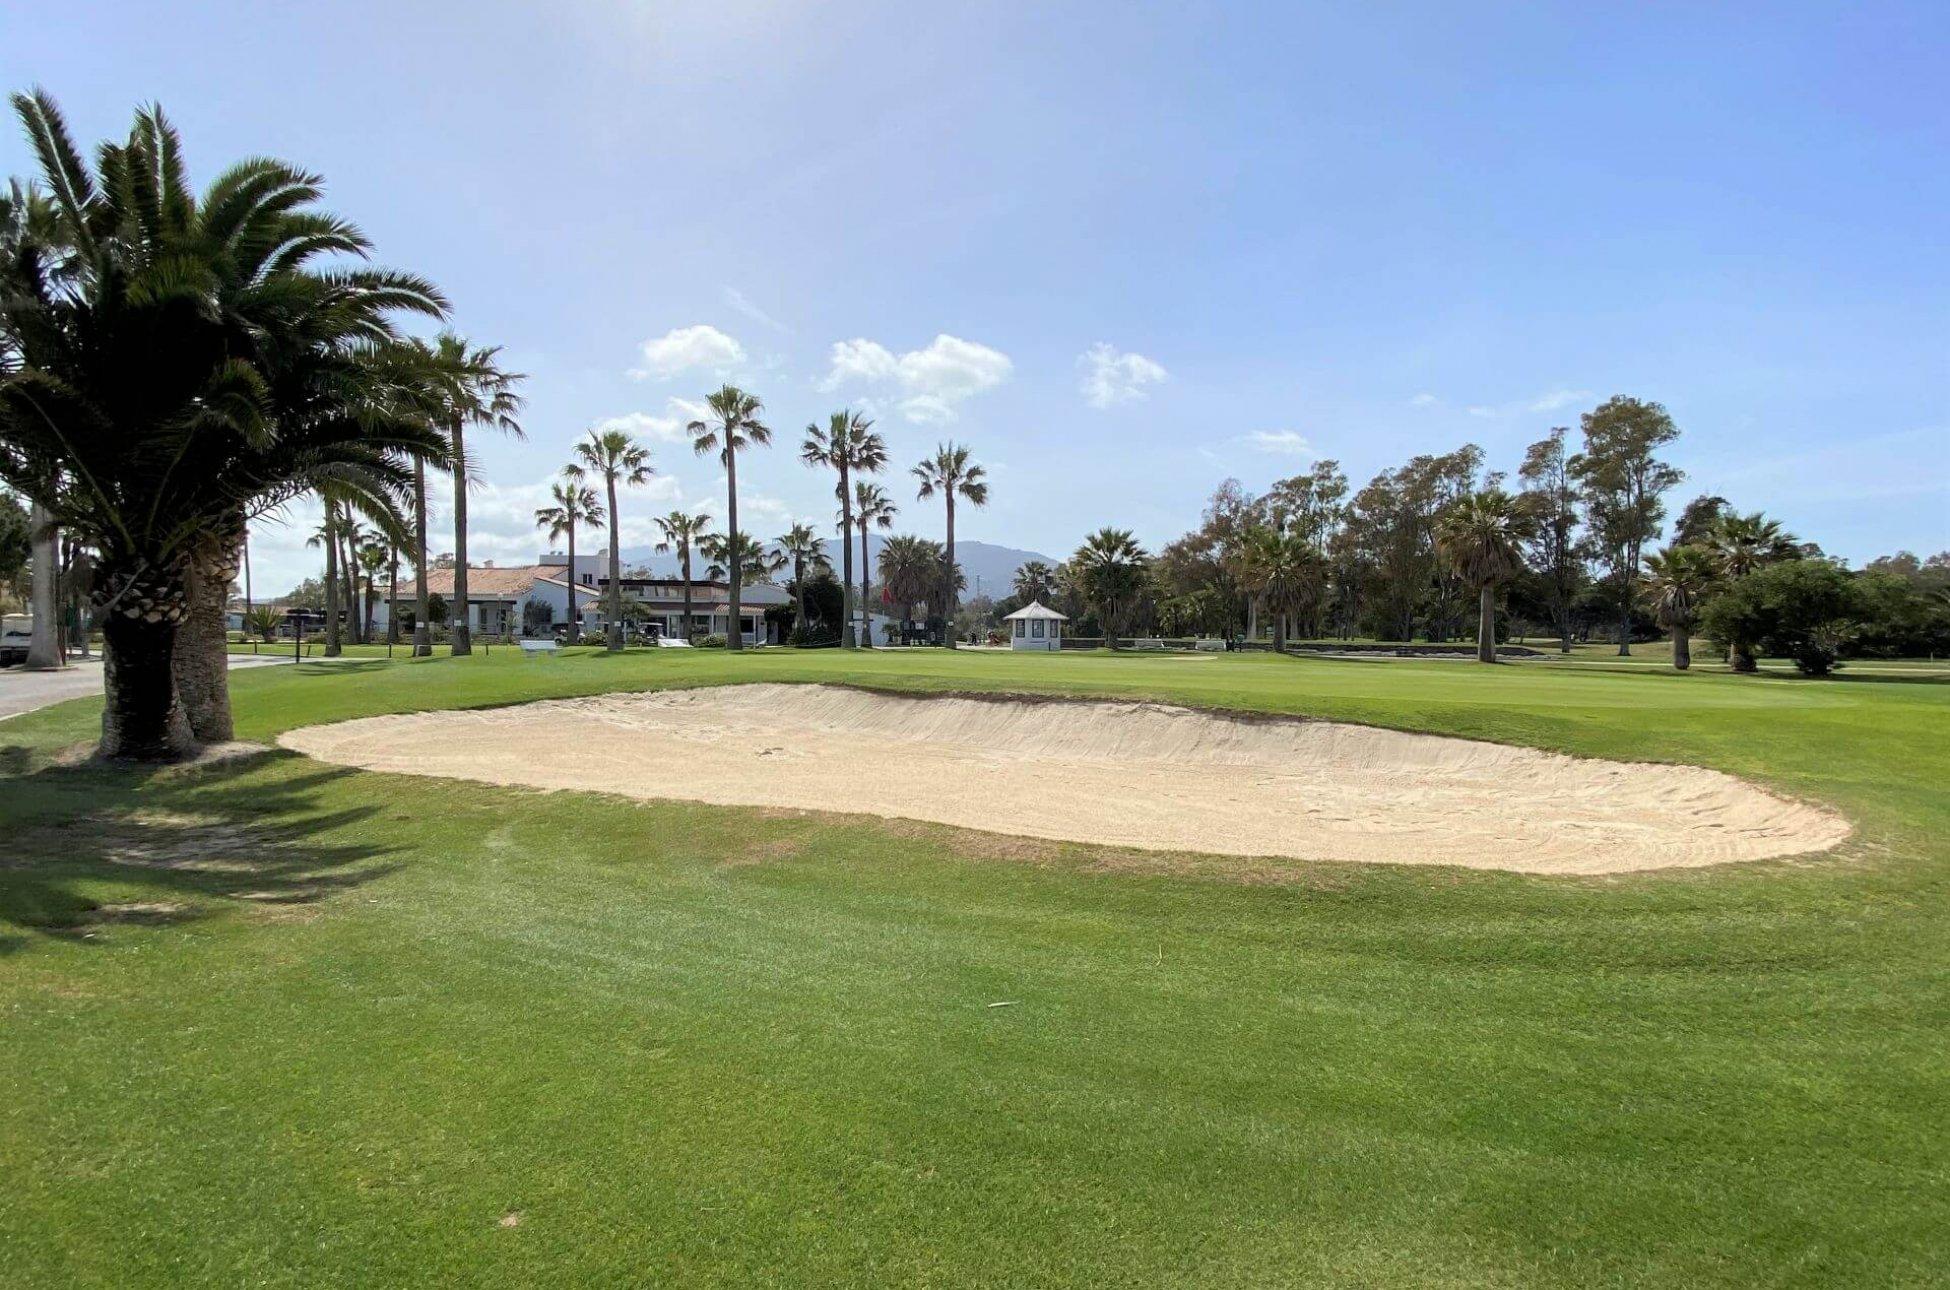 pola golfowe Andaluzja